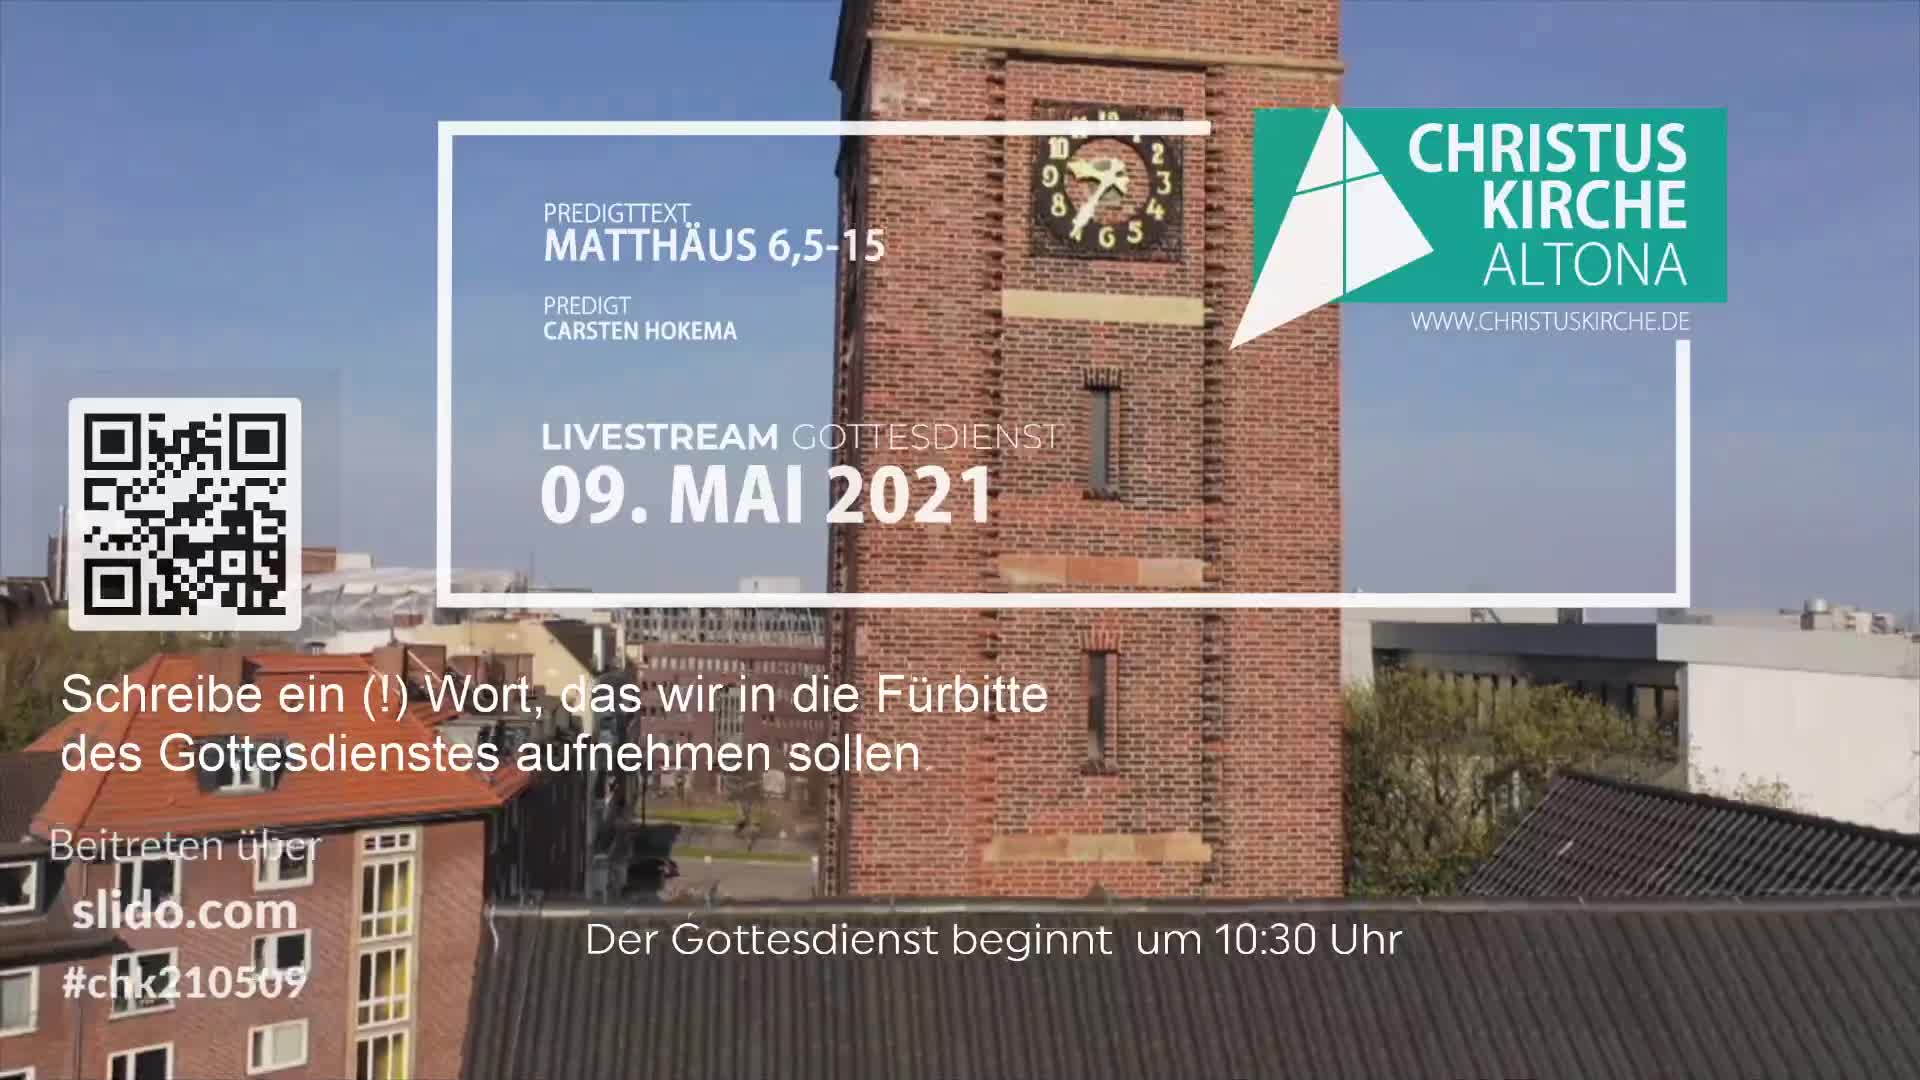 Gottesdienst - am 09. Mai - Livestream aus der Christuskirche Altona